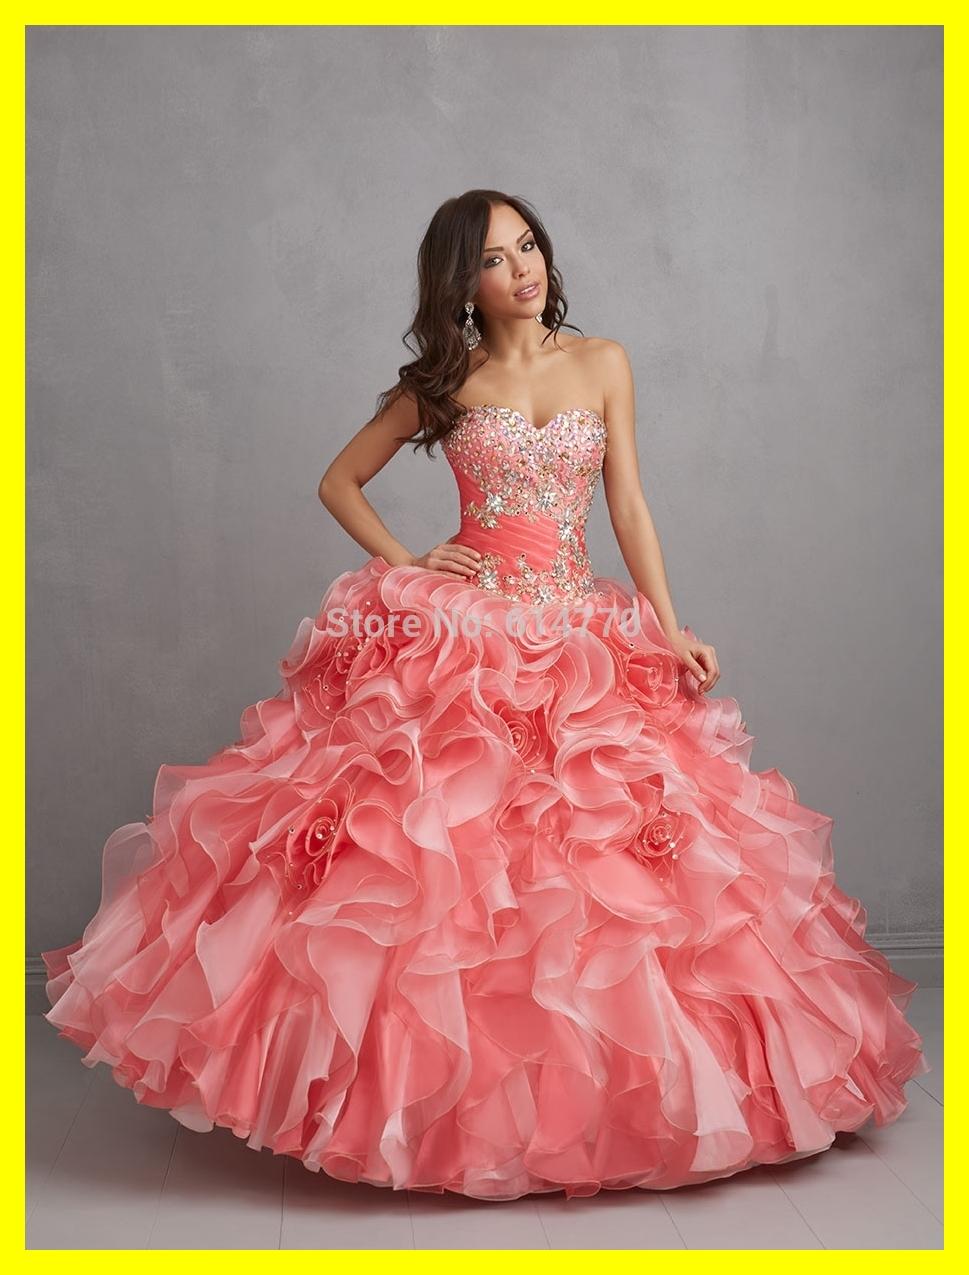 Wedding & Lifestyle: Short prom dresses high street